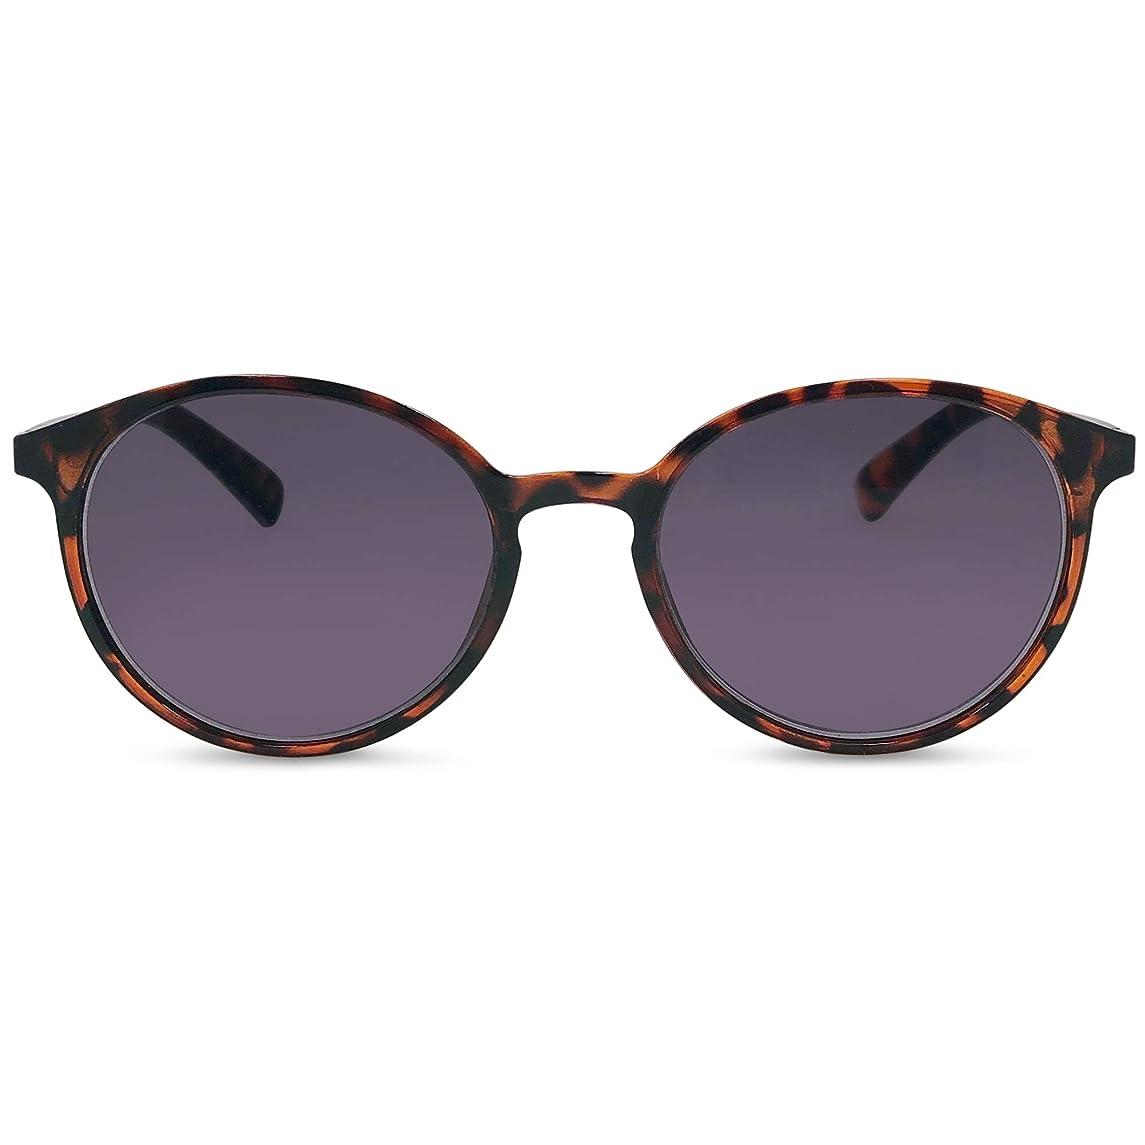 In Style Eyes Nova Full Sun Readers for Women and Men. Not bifocals